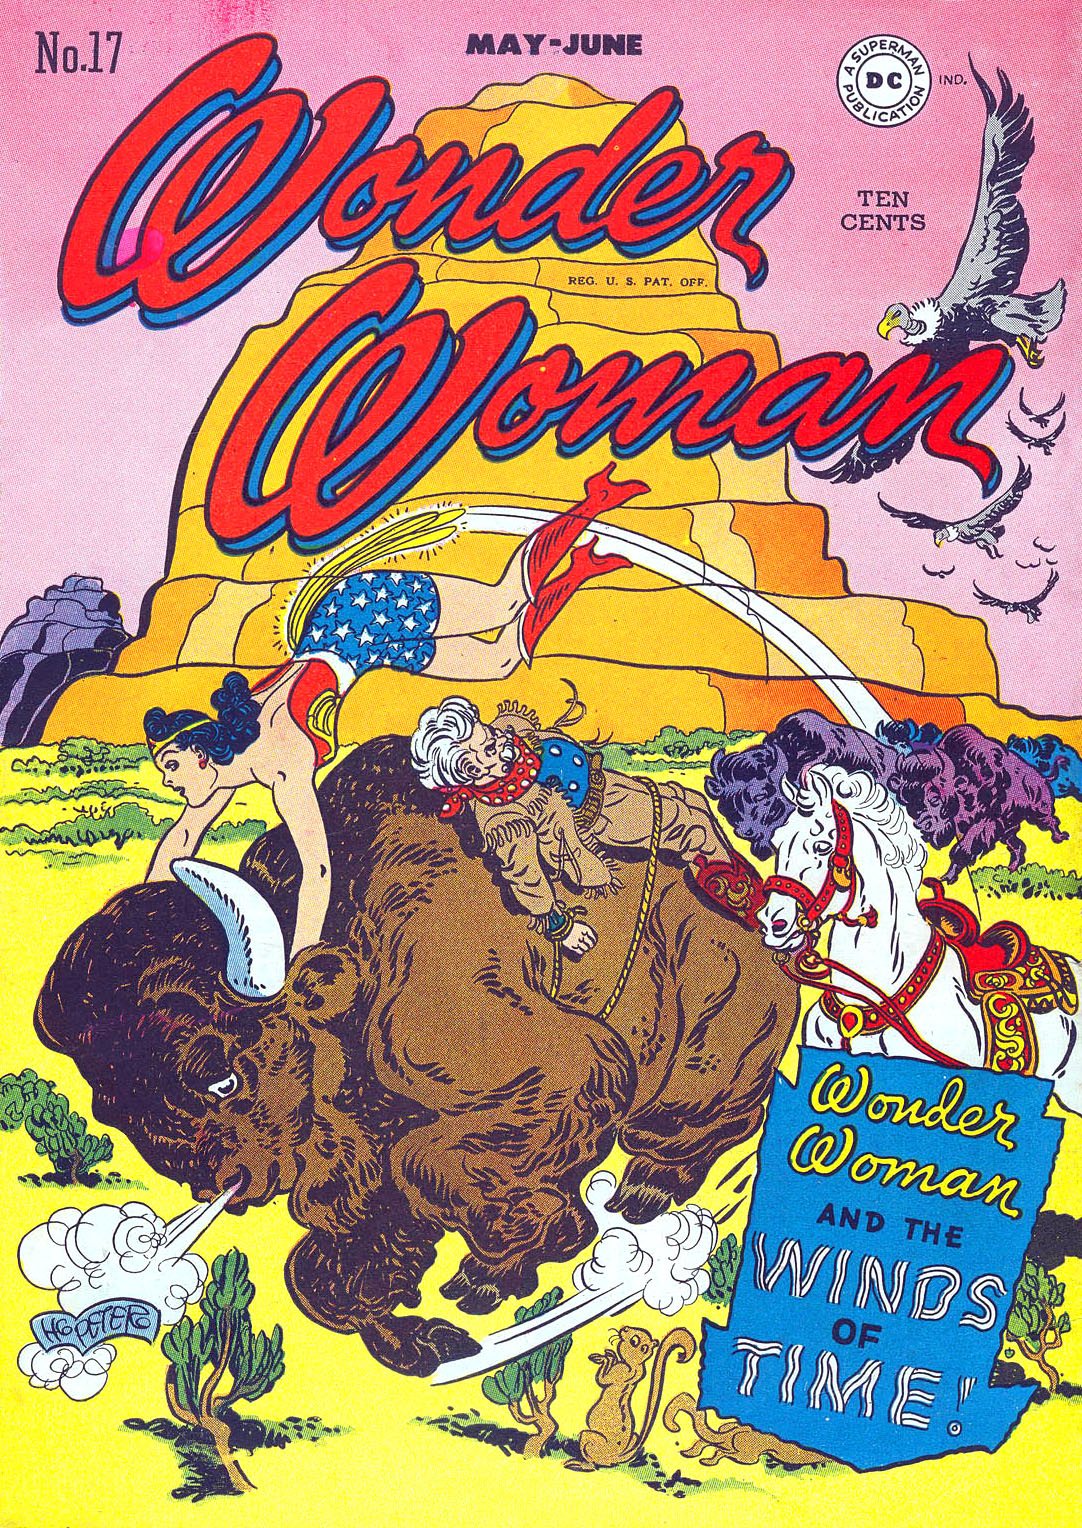 Read online Wonder Woman (1942) comic -  Issue #17 - 1